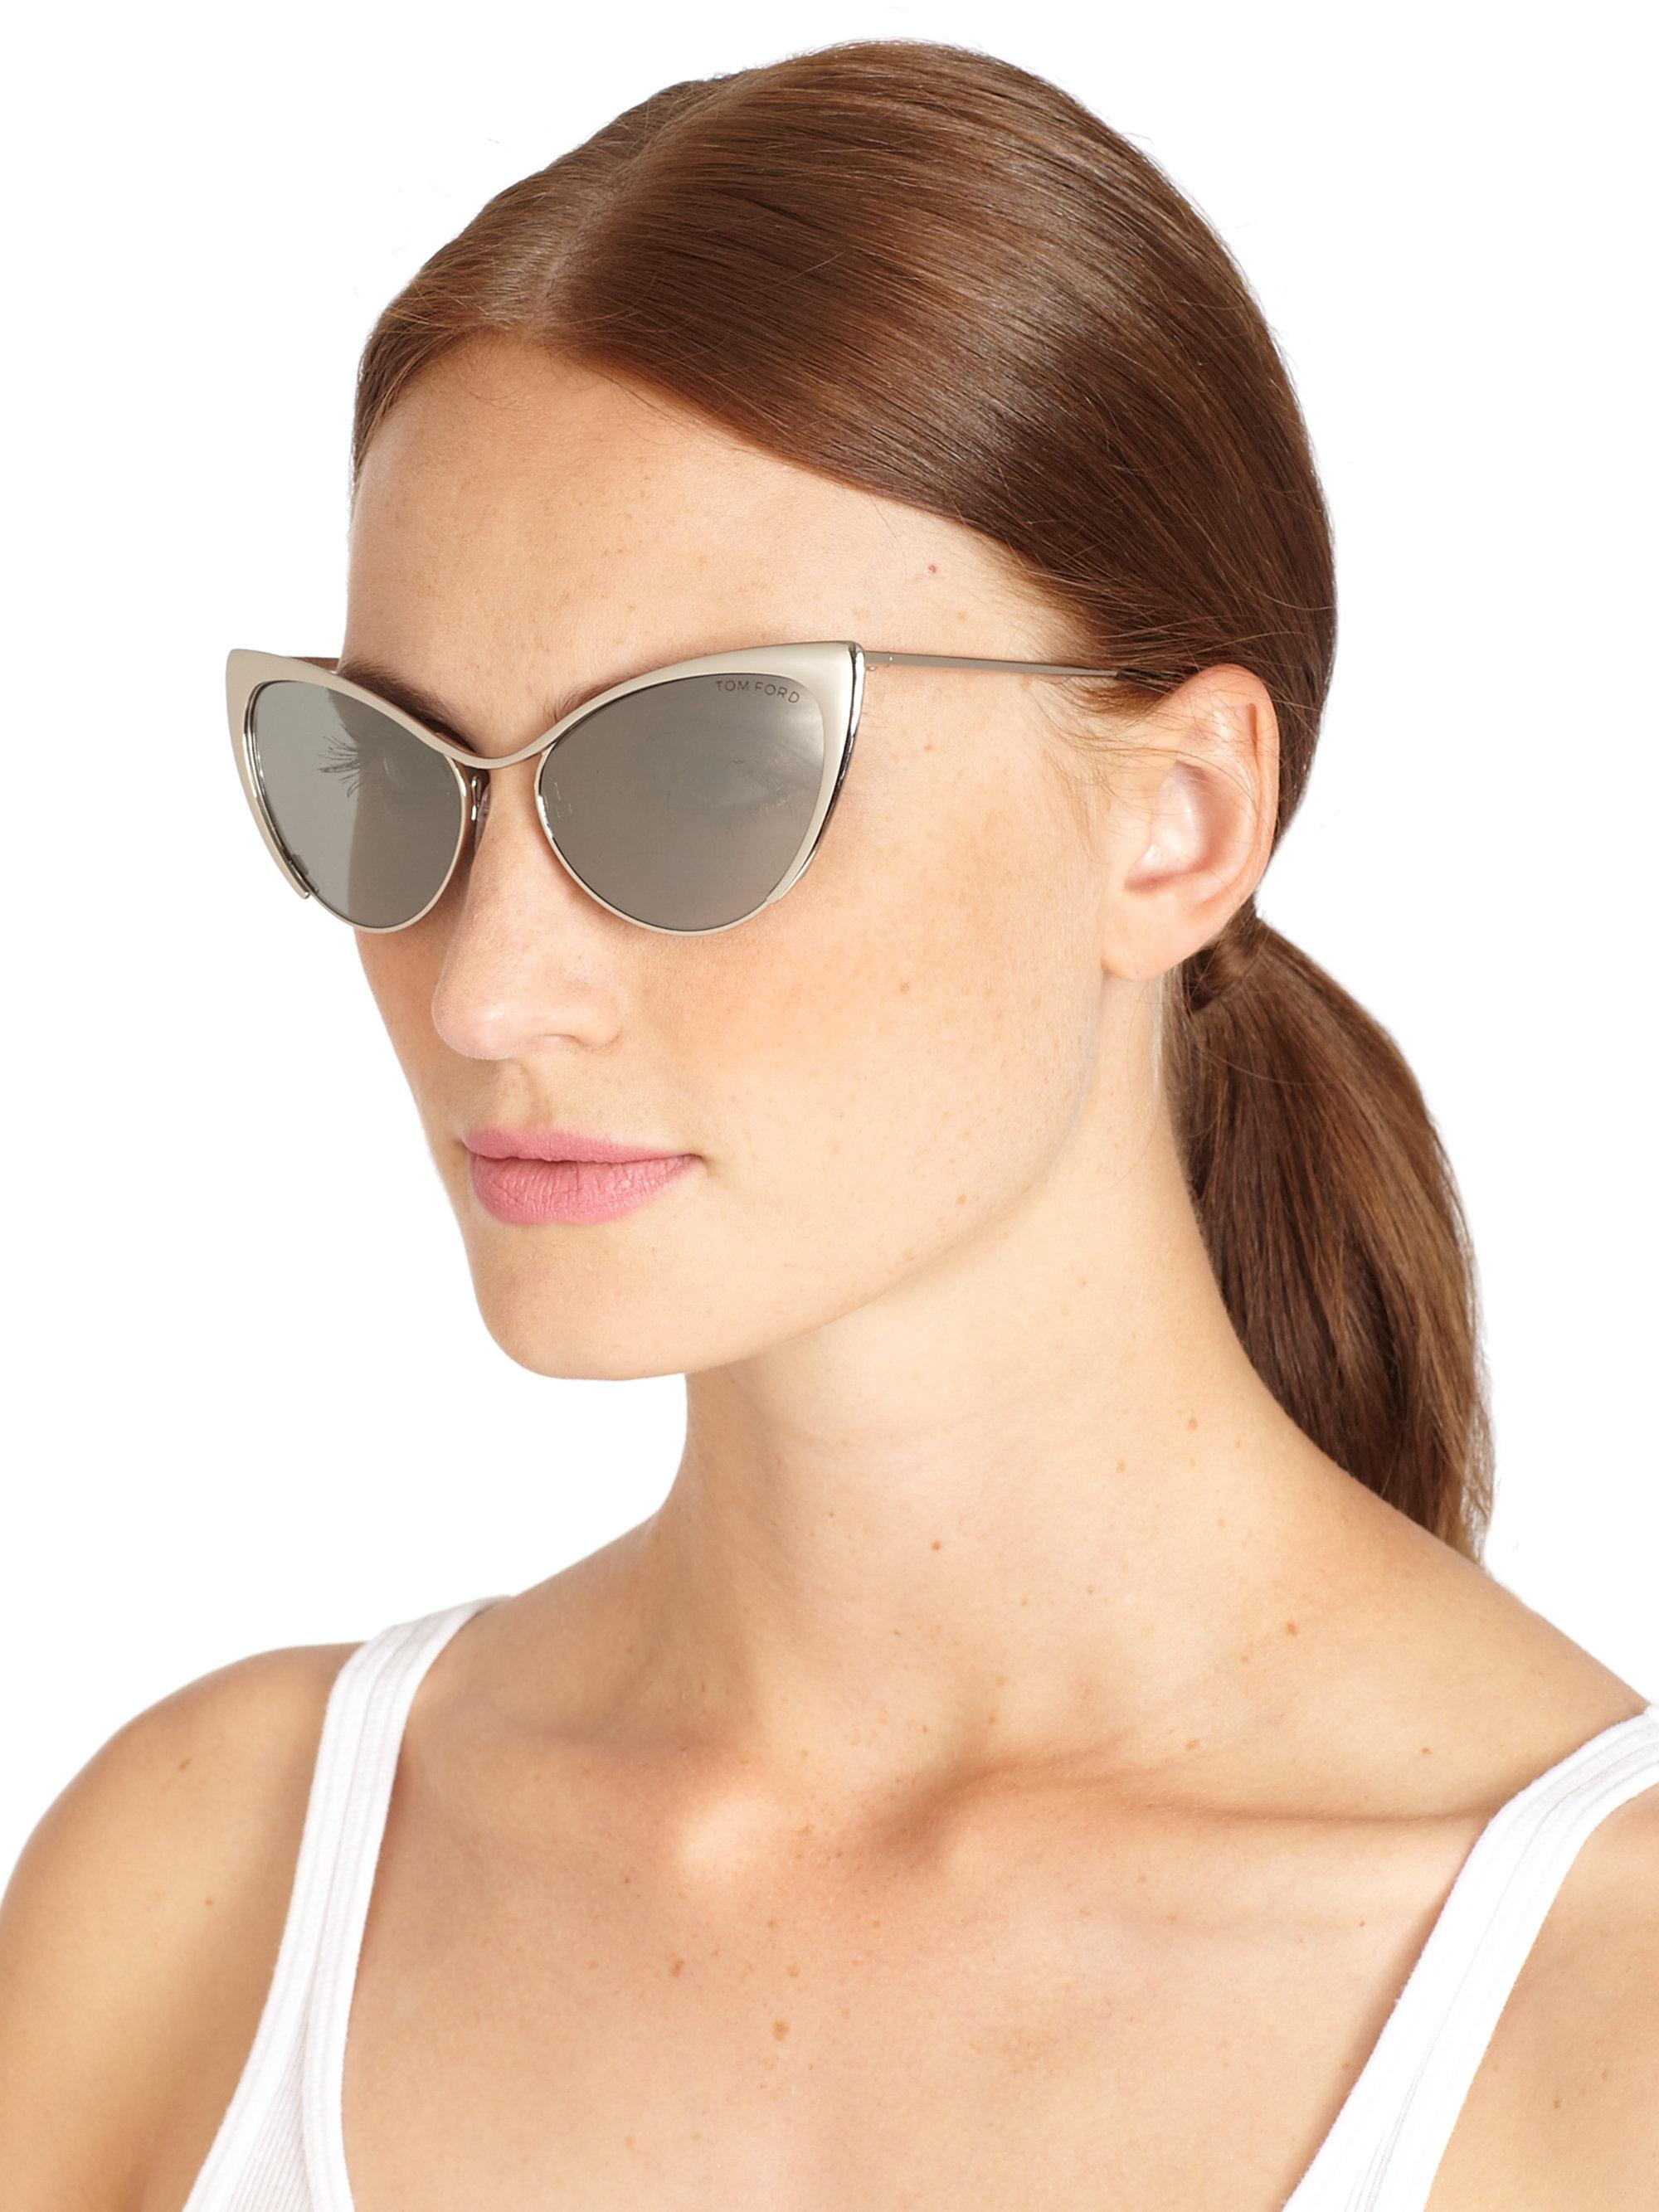 tom ford henry horn rimmed sunglasses in brown smoke lyst. Black Bedroom Furniture Sets. Home Design Ideas